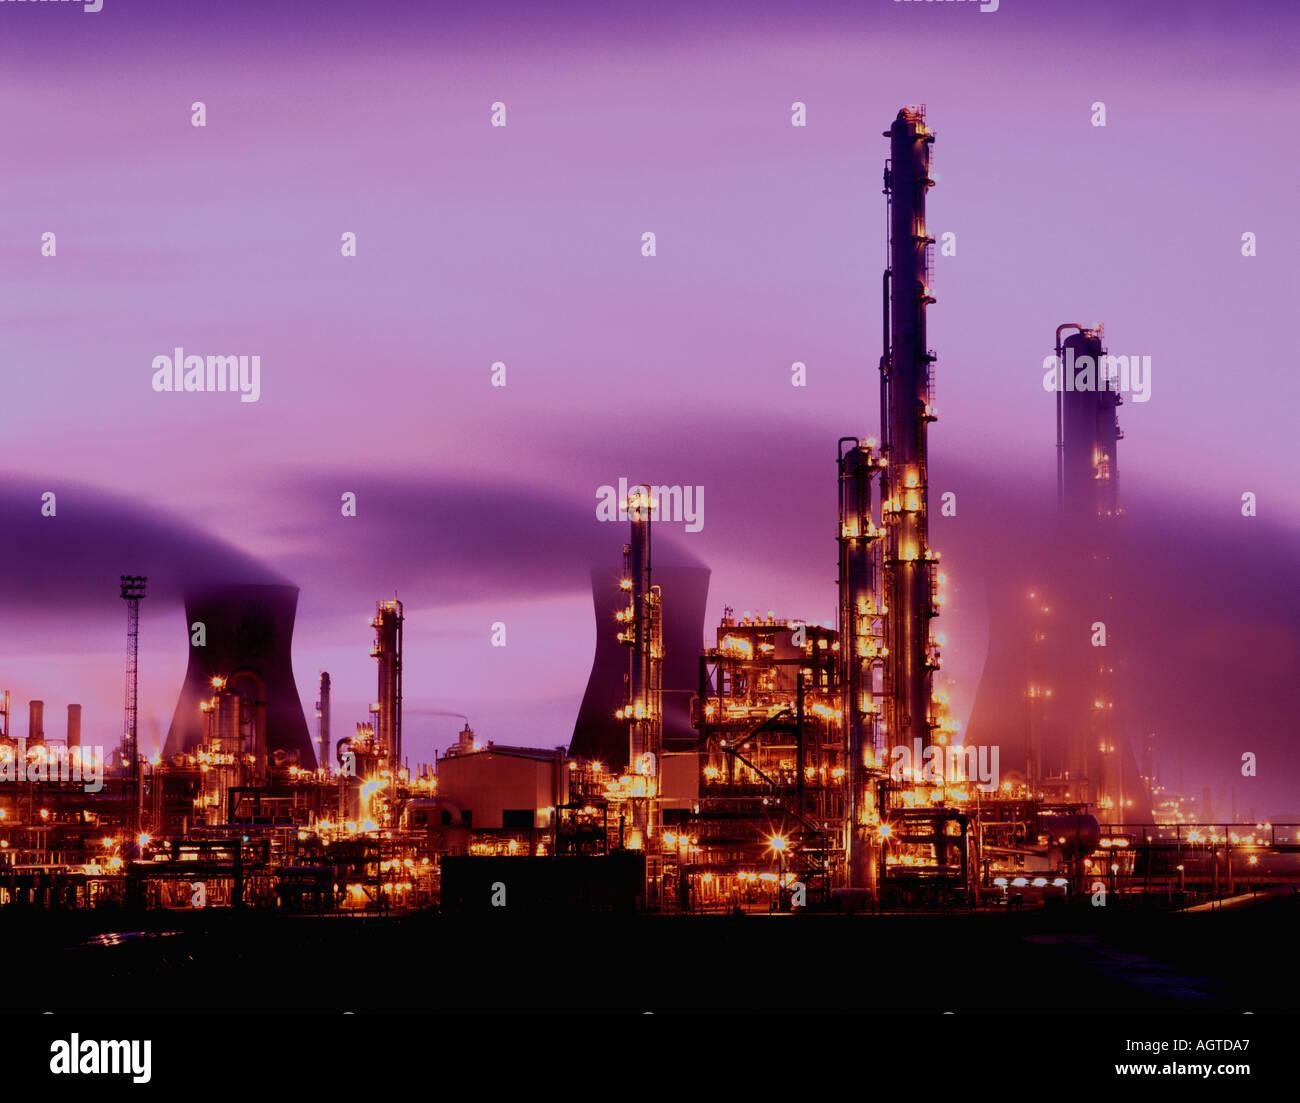 uk-scotland-grangemouth-oil-refinery-AGT